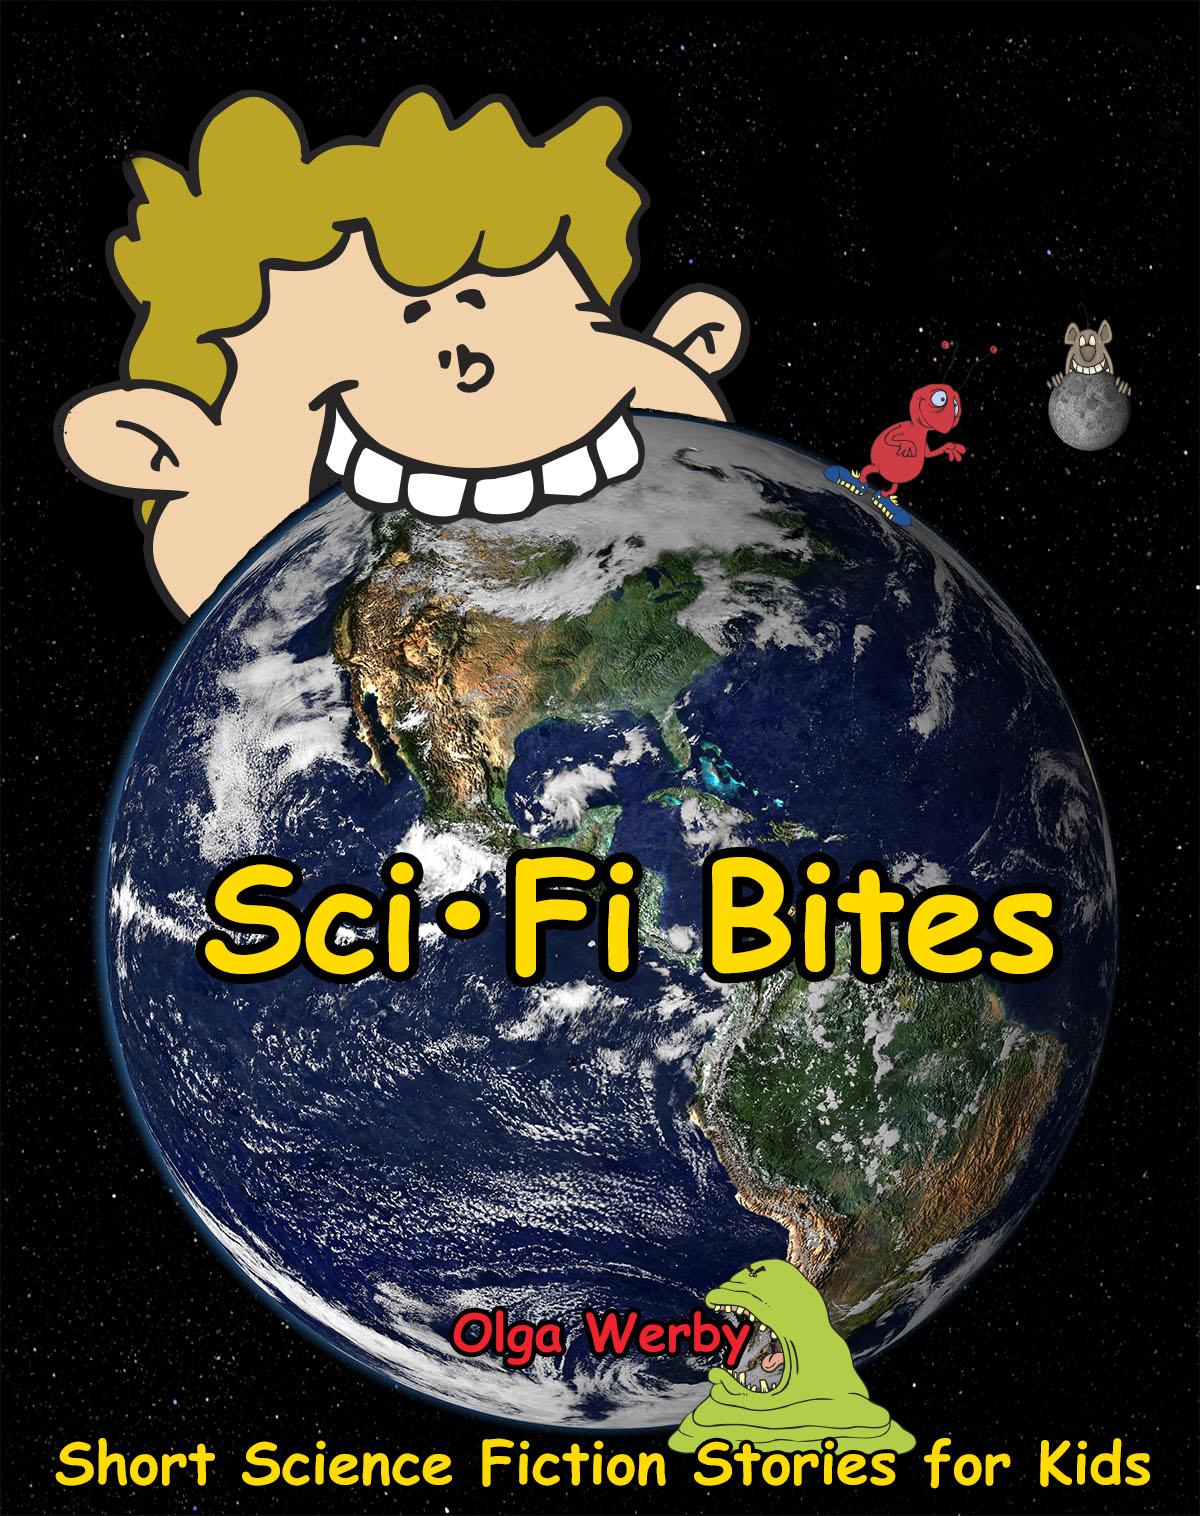 Sci-Fi Bites Cover Illustration